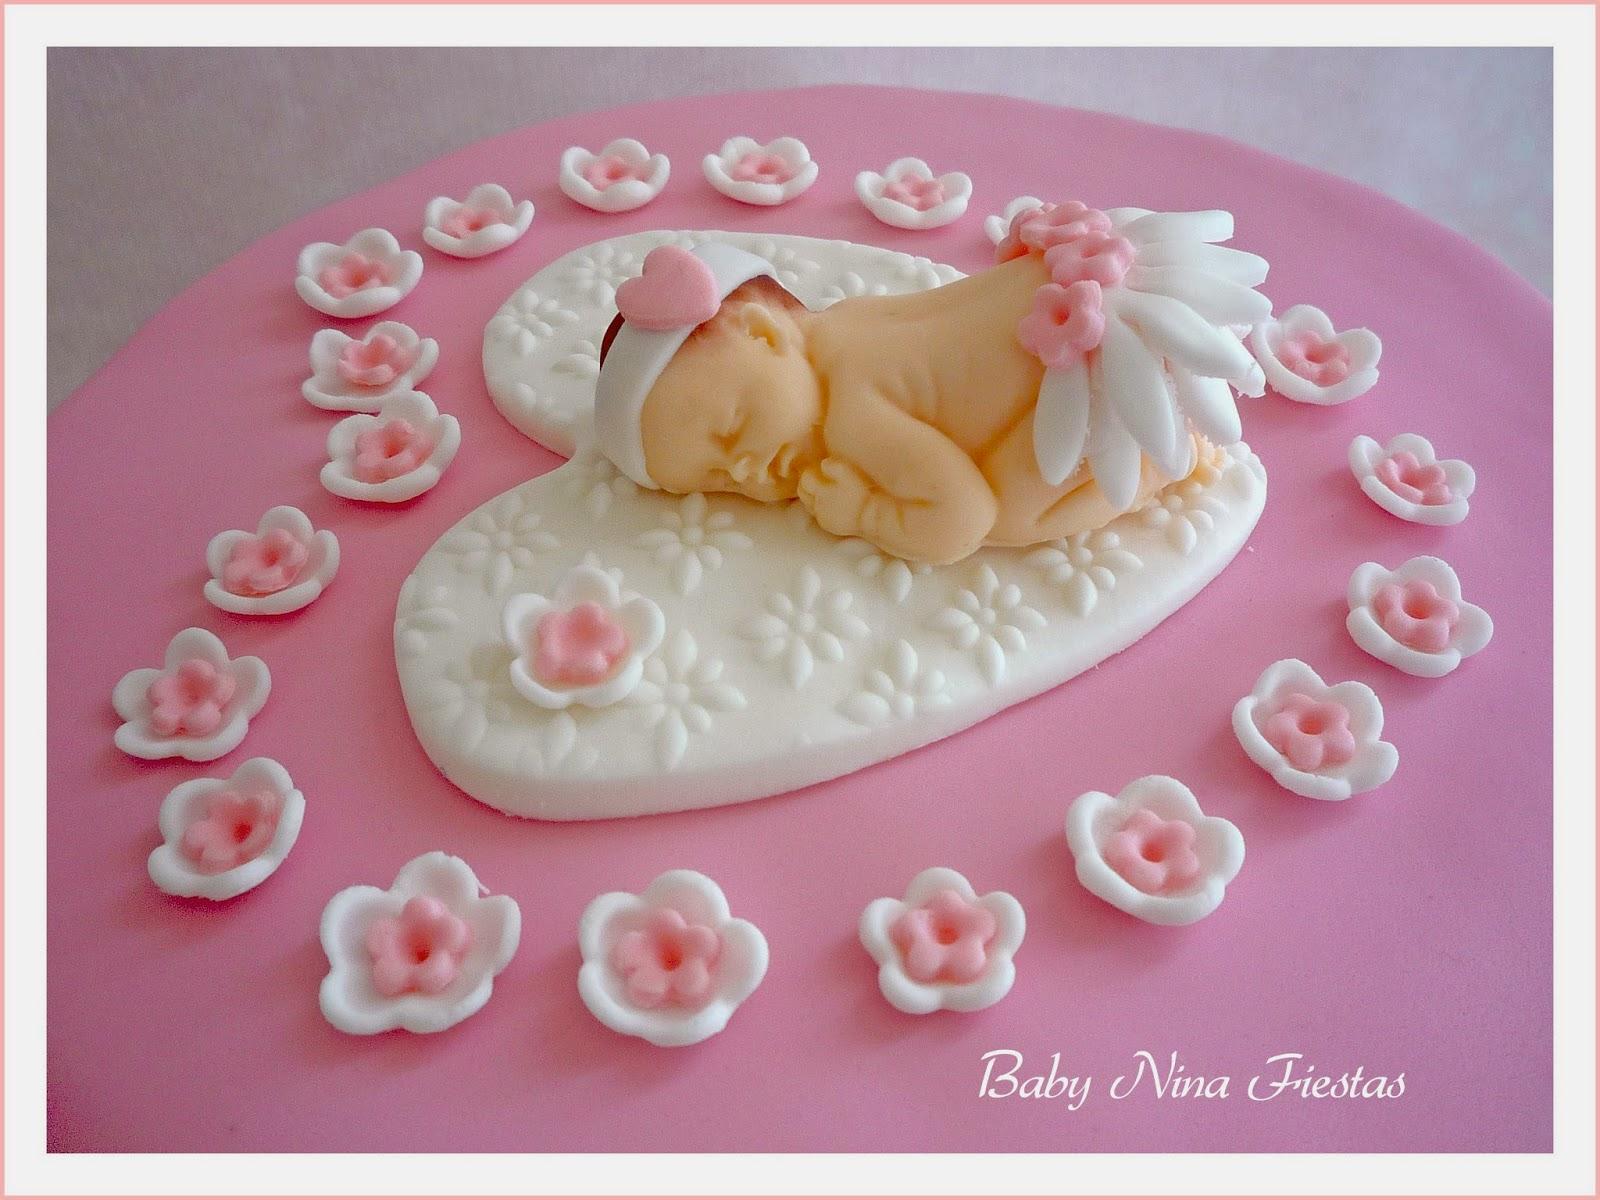 Excellent Baby Nina Fiestas Tarta Baby Shower Para Joana Tarta Baby Shower  Nia Medustfo Gallery With Fiesta Baby Shower Nia